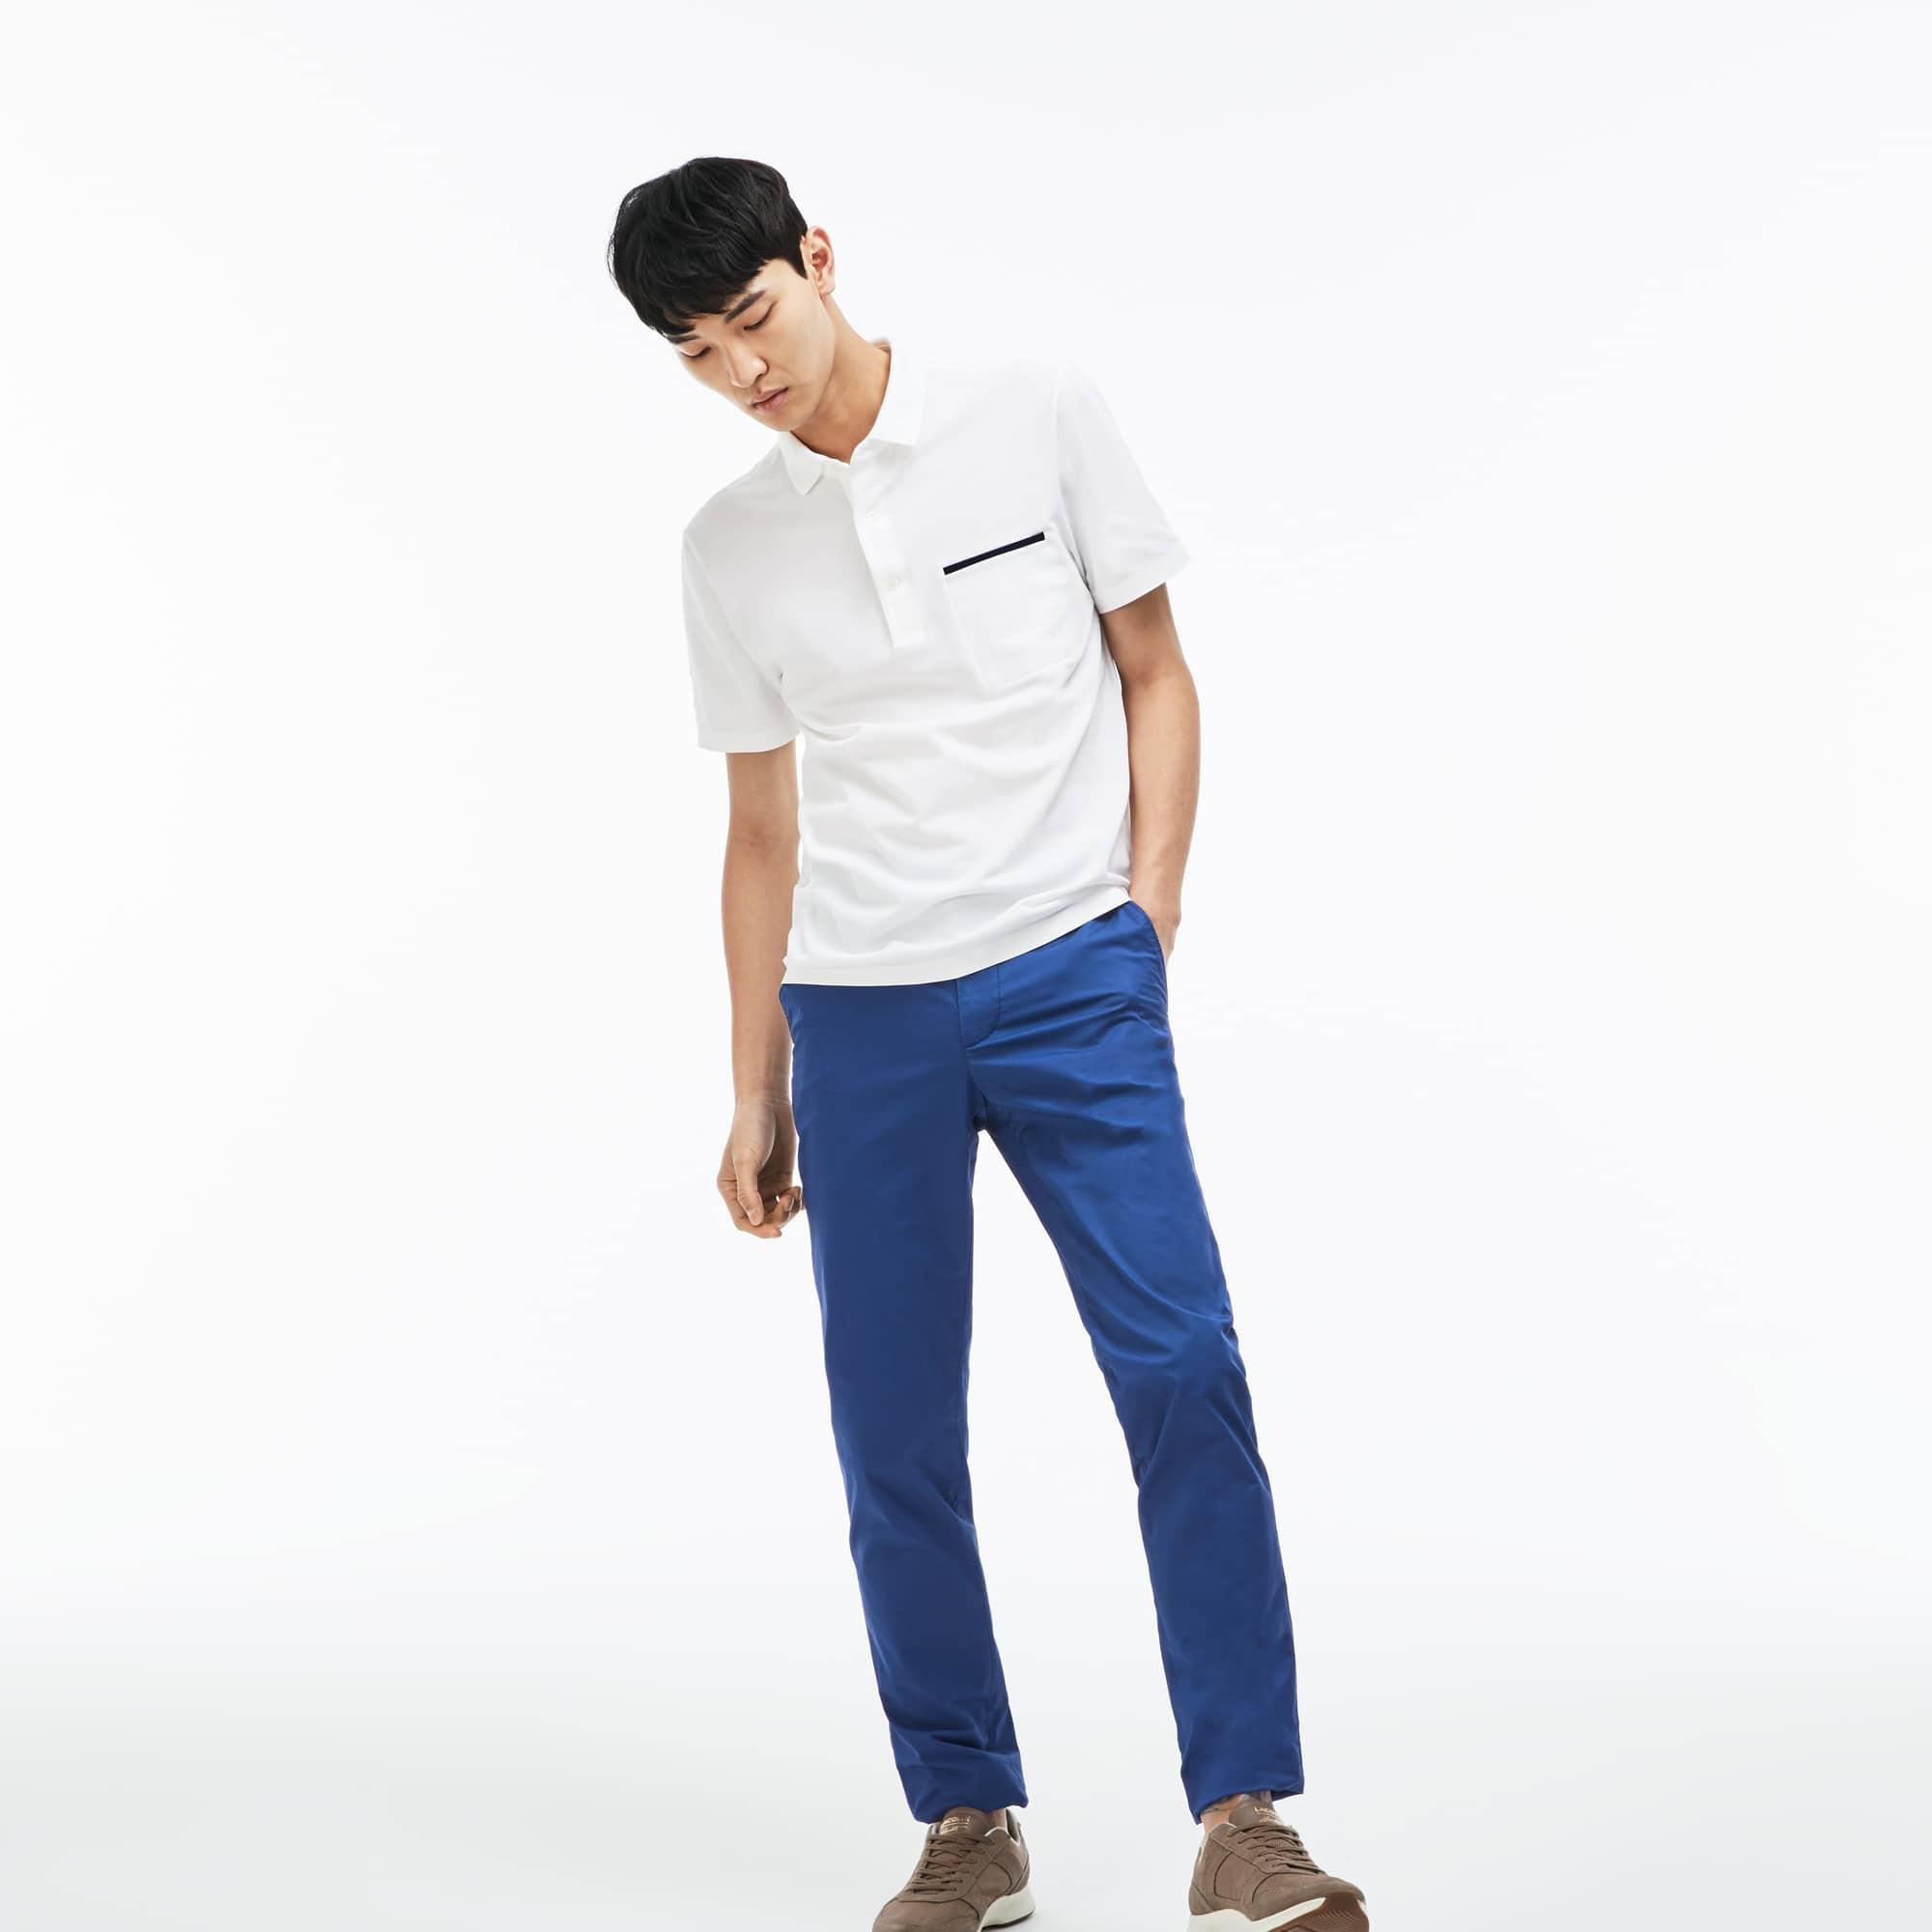 Men's Slim Fit Stretch Pima Cotton Twill Chino Pants